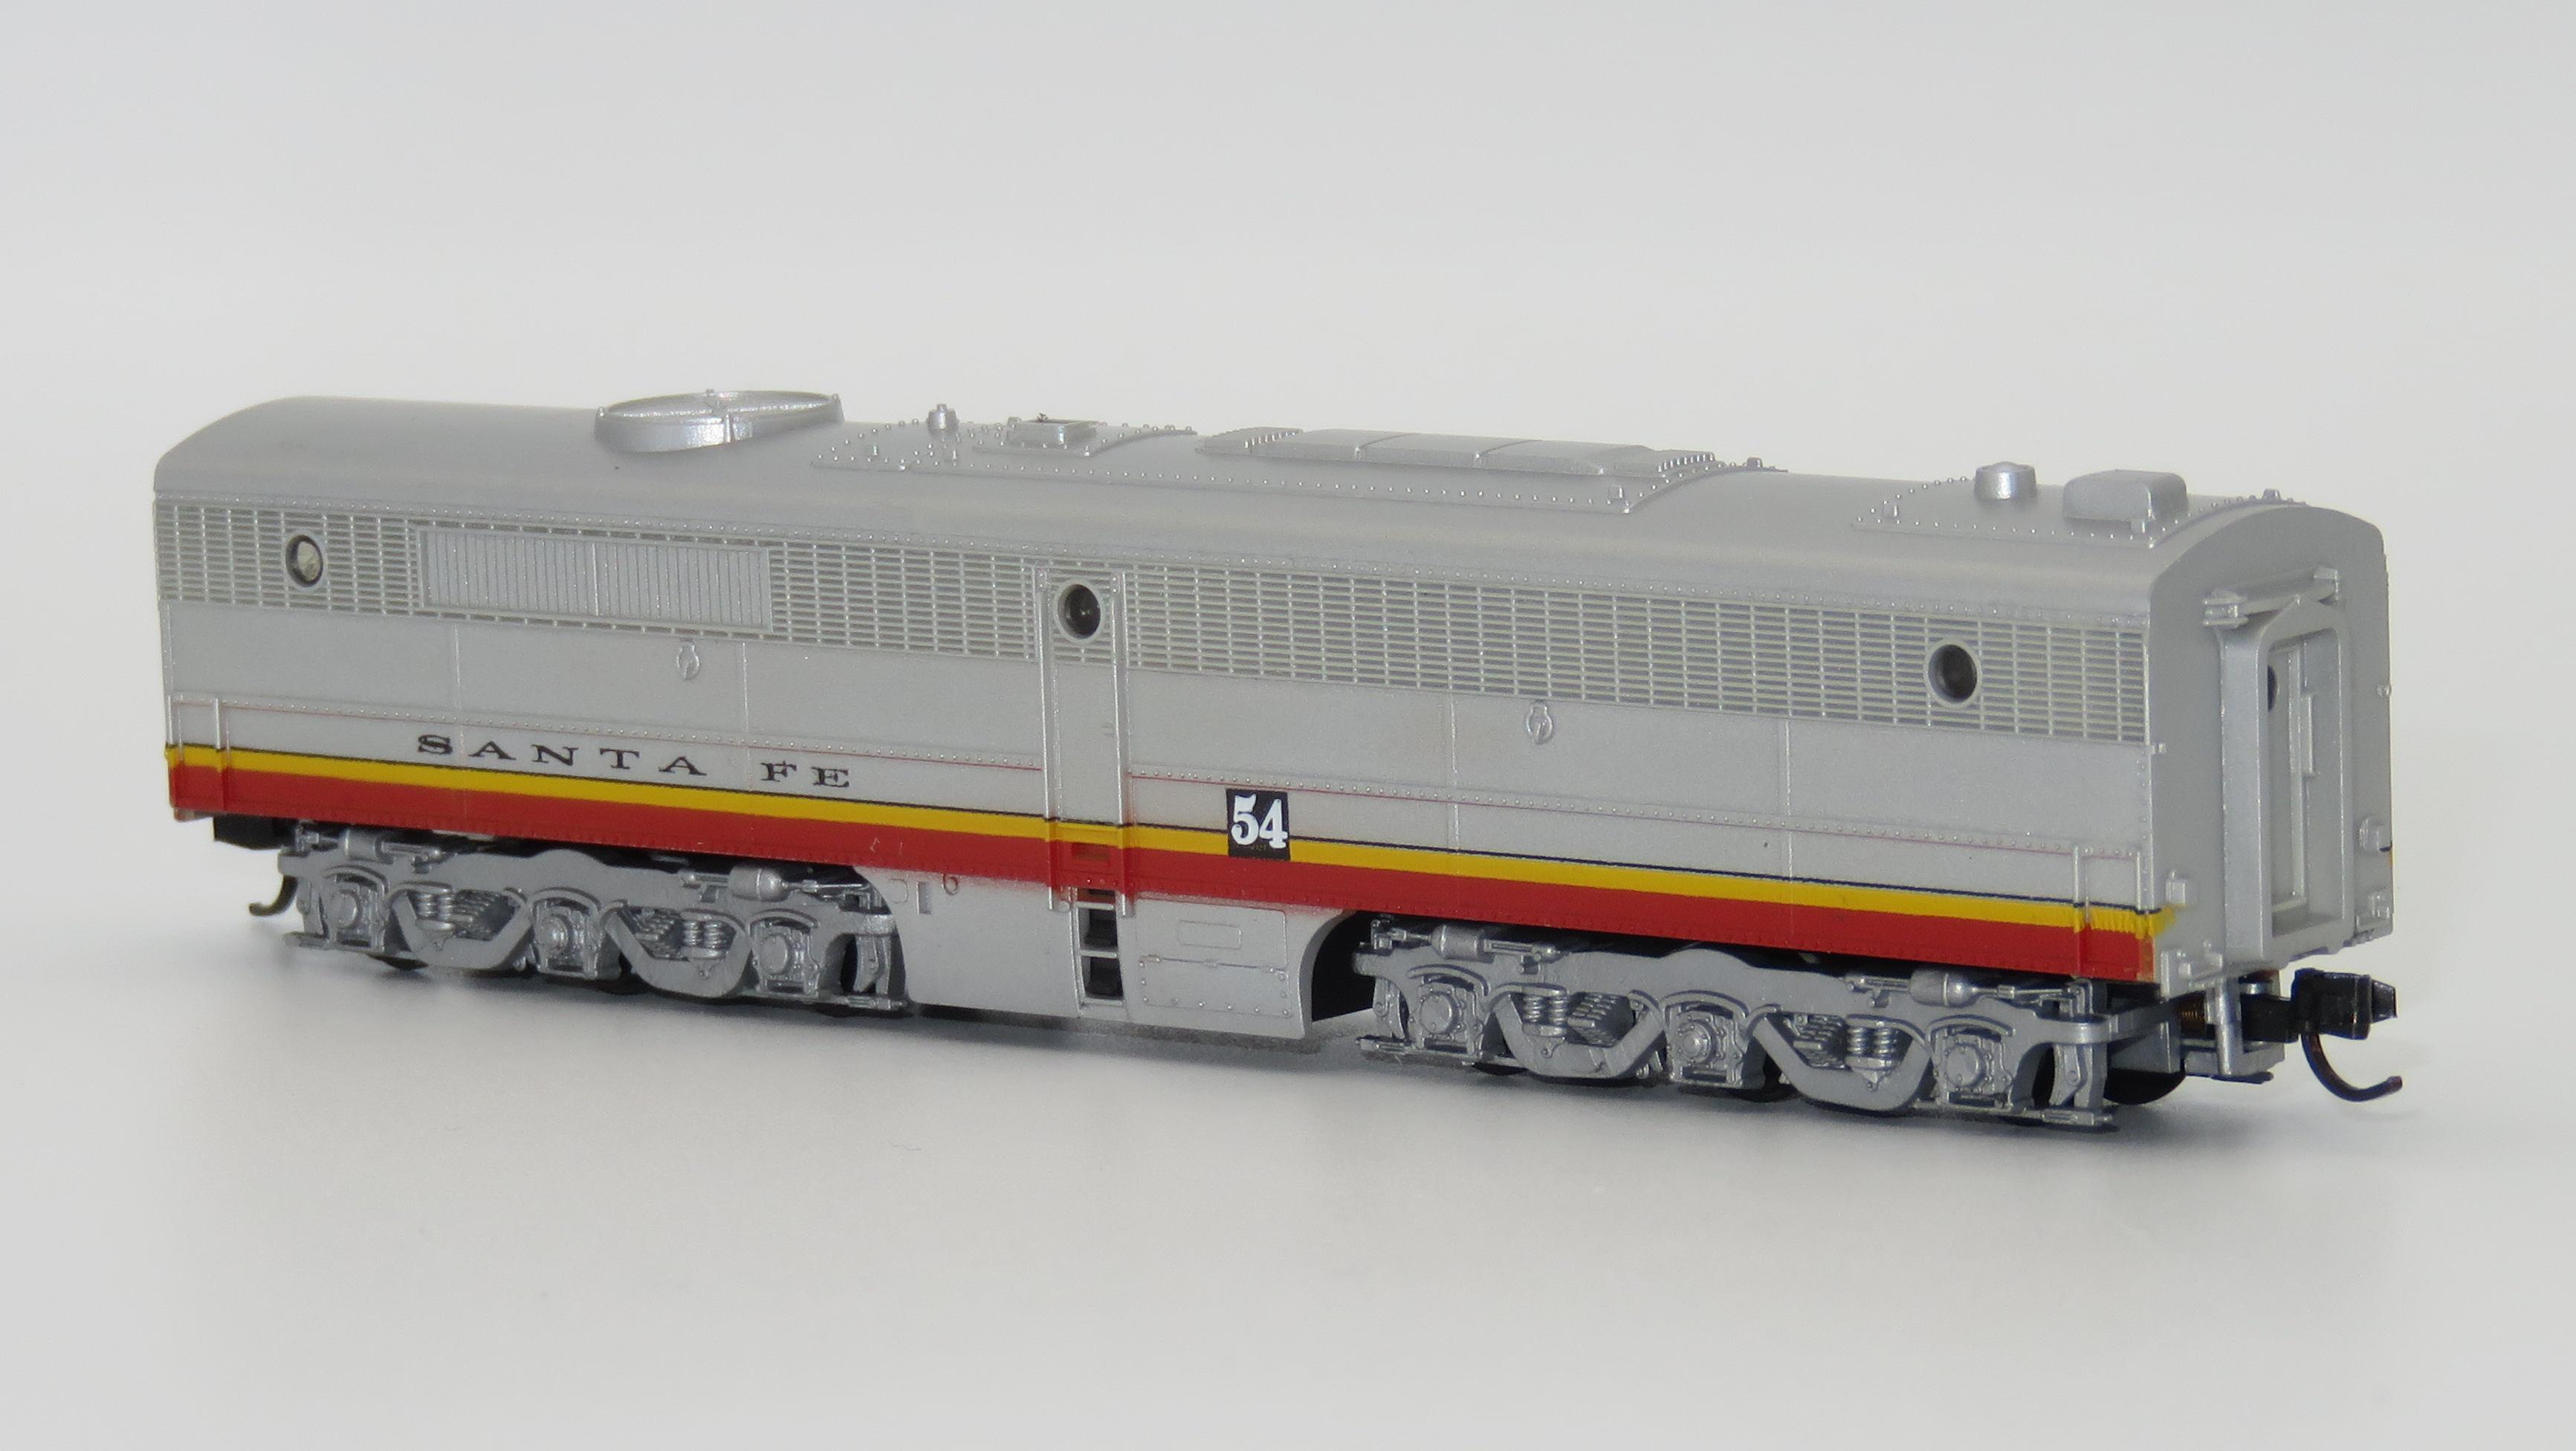 N Scale - Con-Cor - 0001-202042 - Locomotive, Diesel, Alco PA/PB - Santa Fe - 54